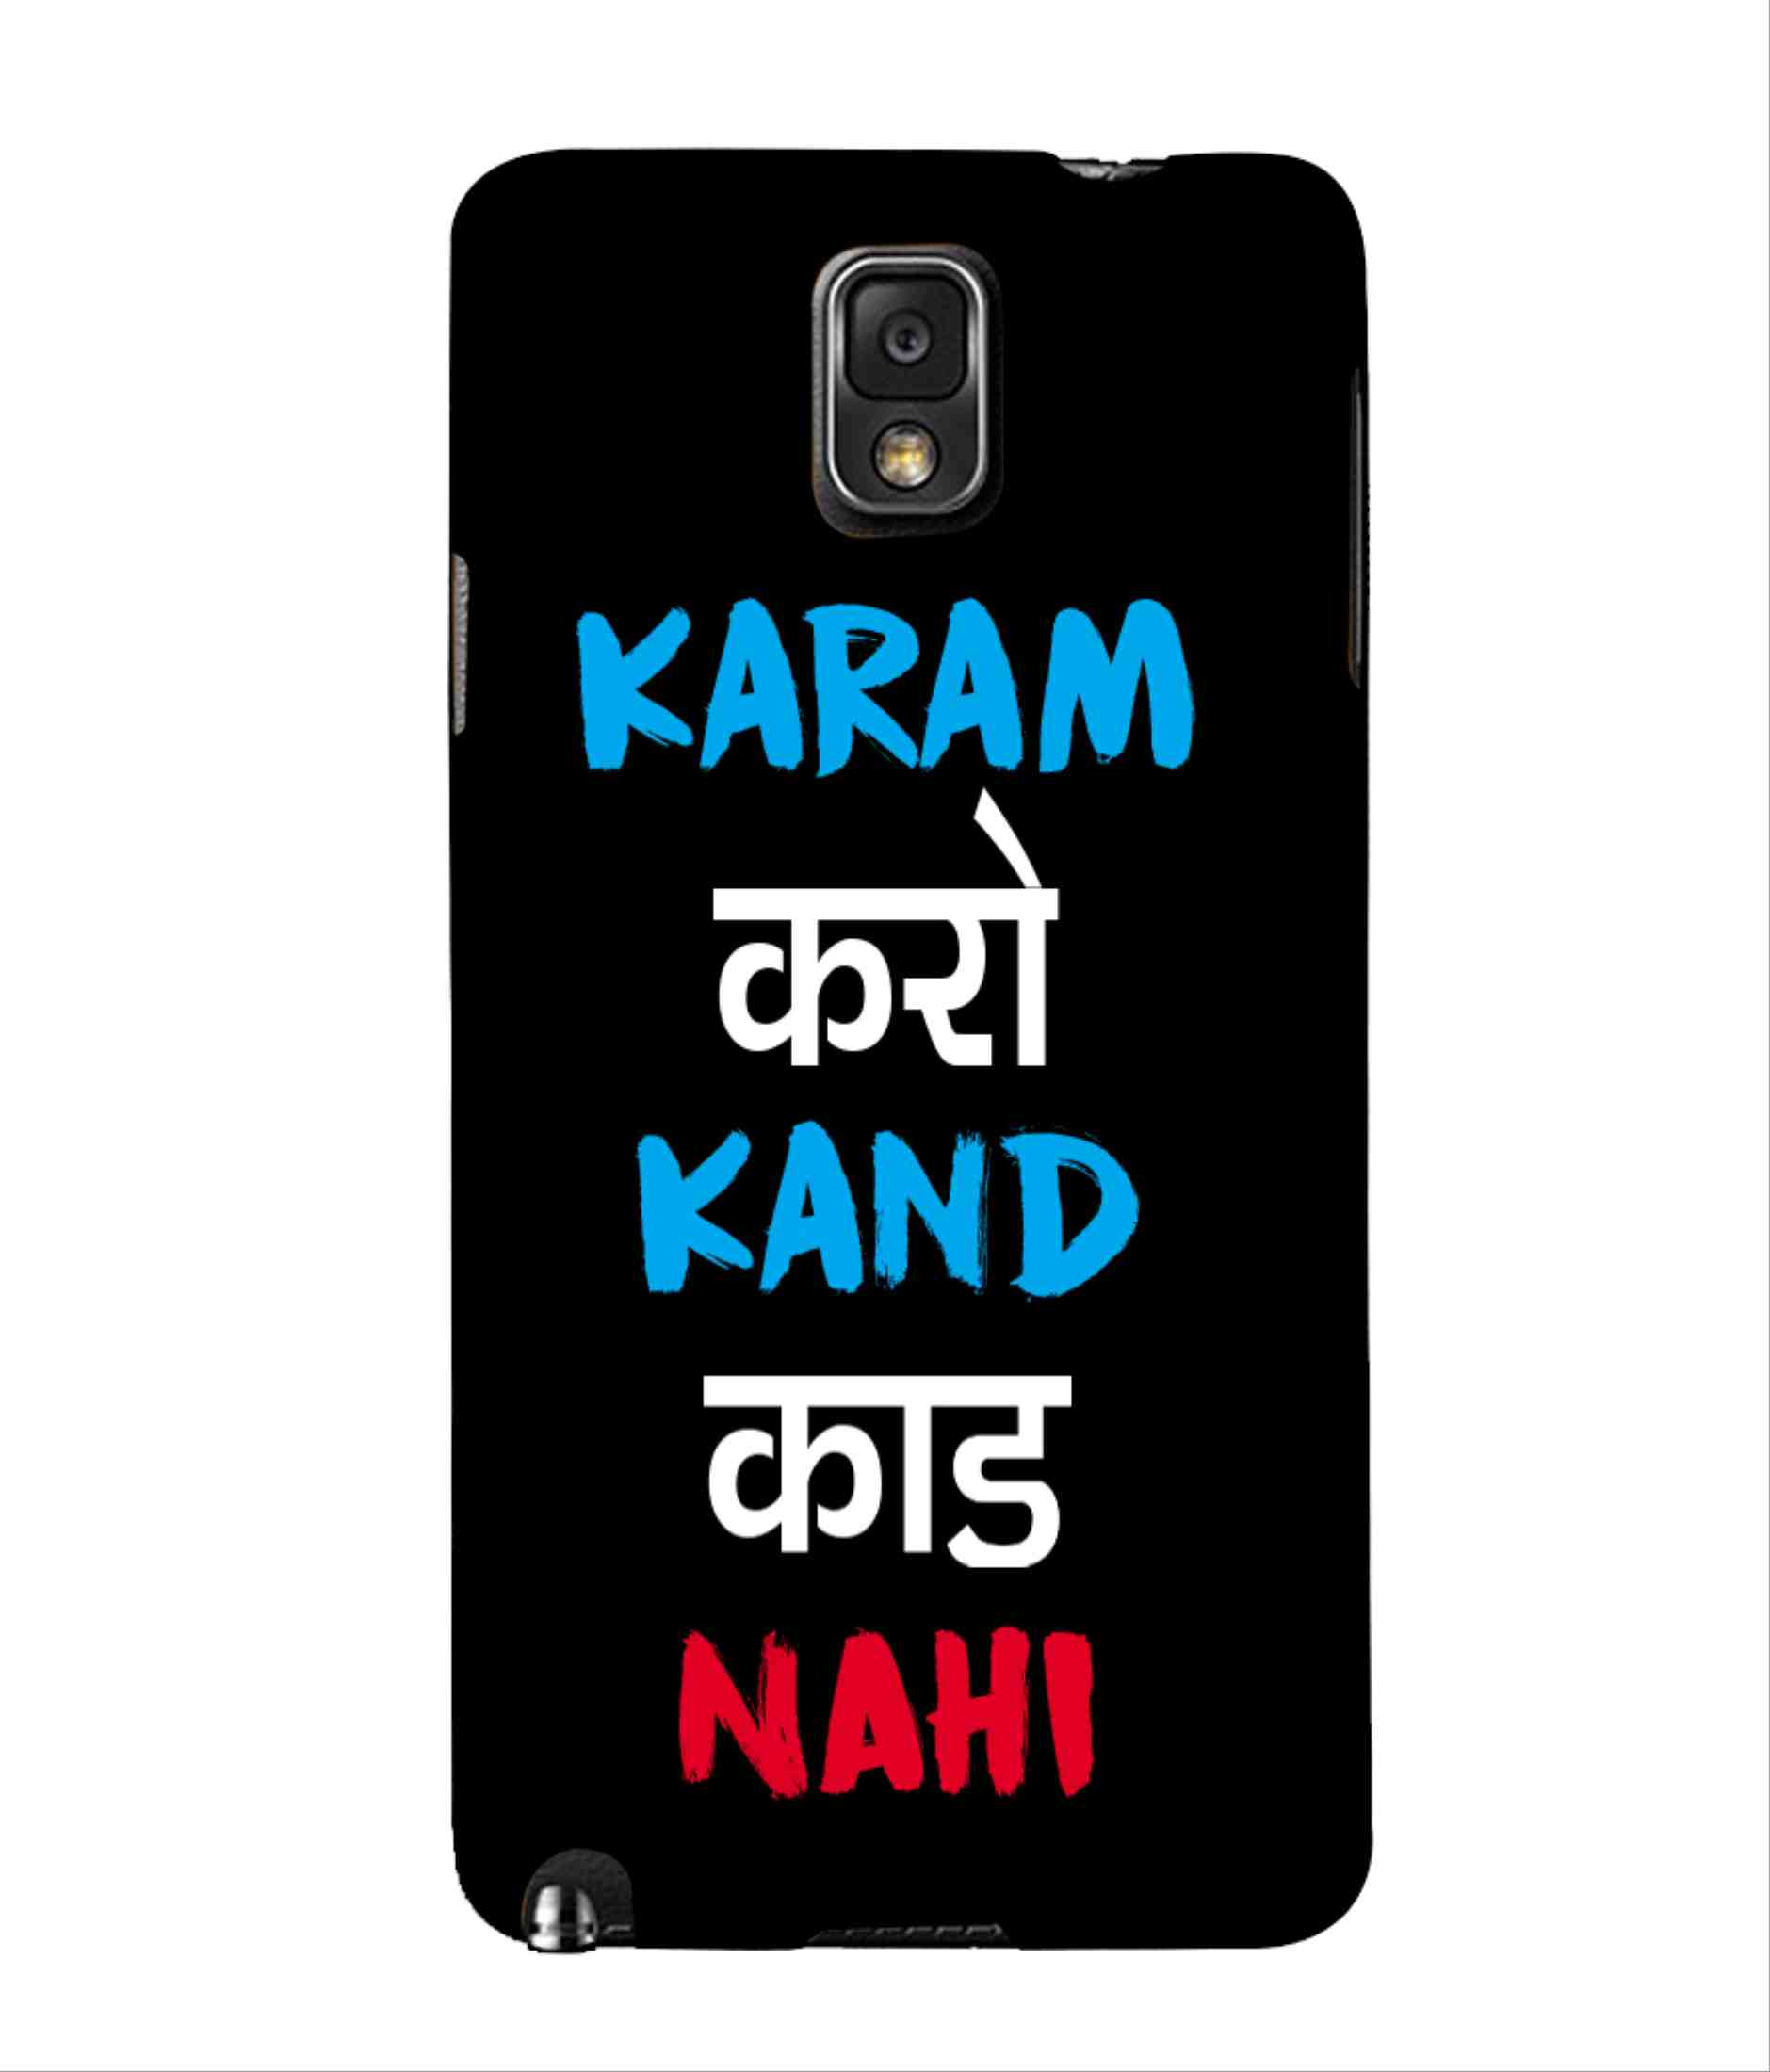 Vibrante Mobile Case Cover For Samsung Galaxy Note 3 , Samsung Galaxy Note Iii , Samsung Galaxy Note 3 N9002 , Samsung Galaxy Note N9000 N9005 28914